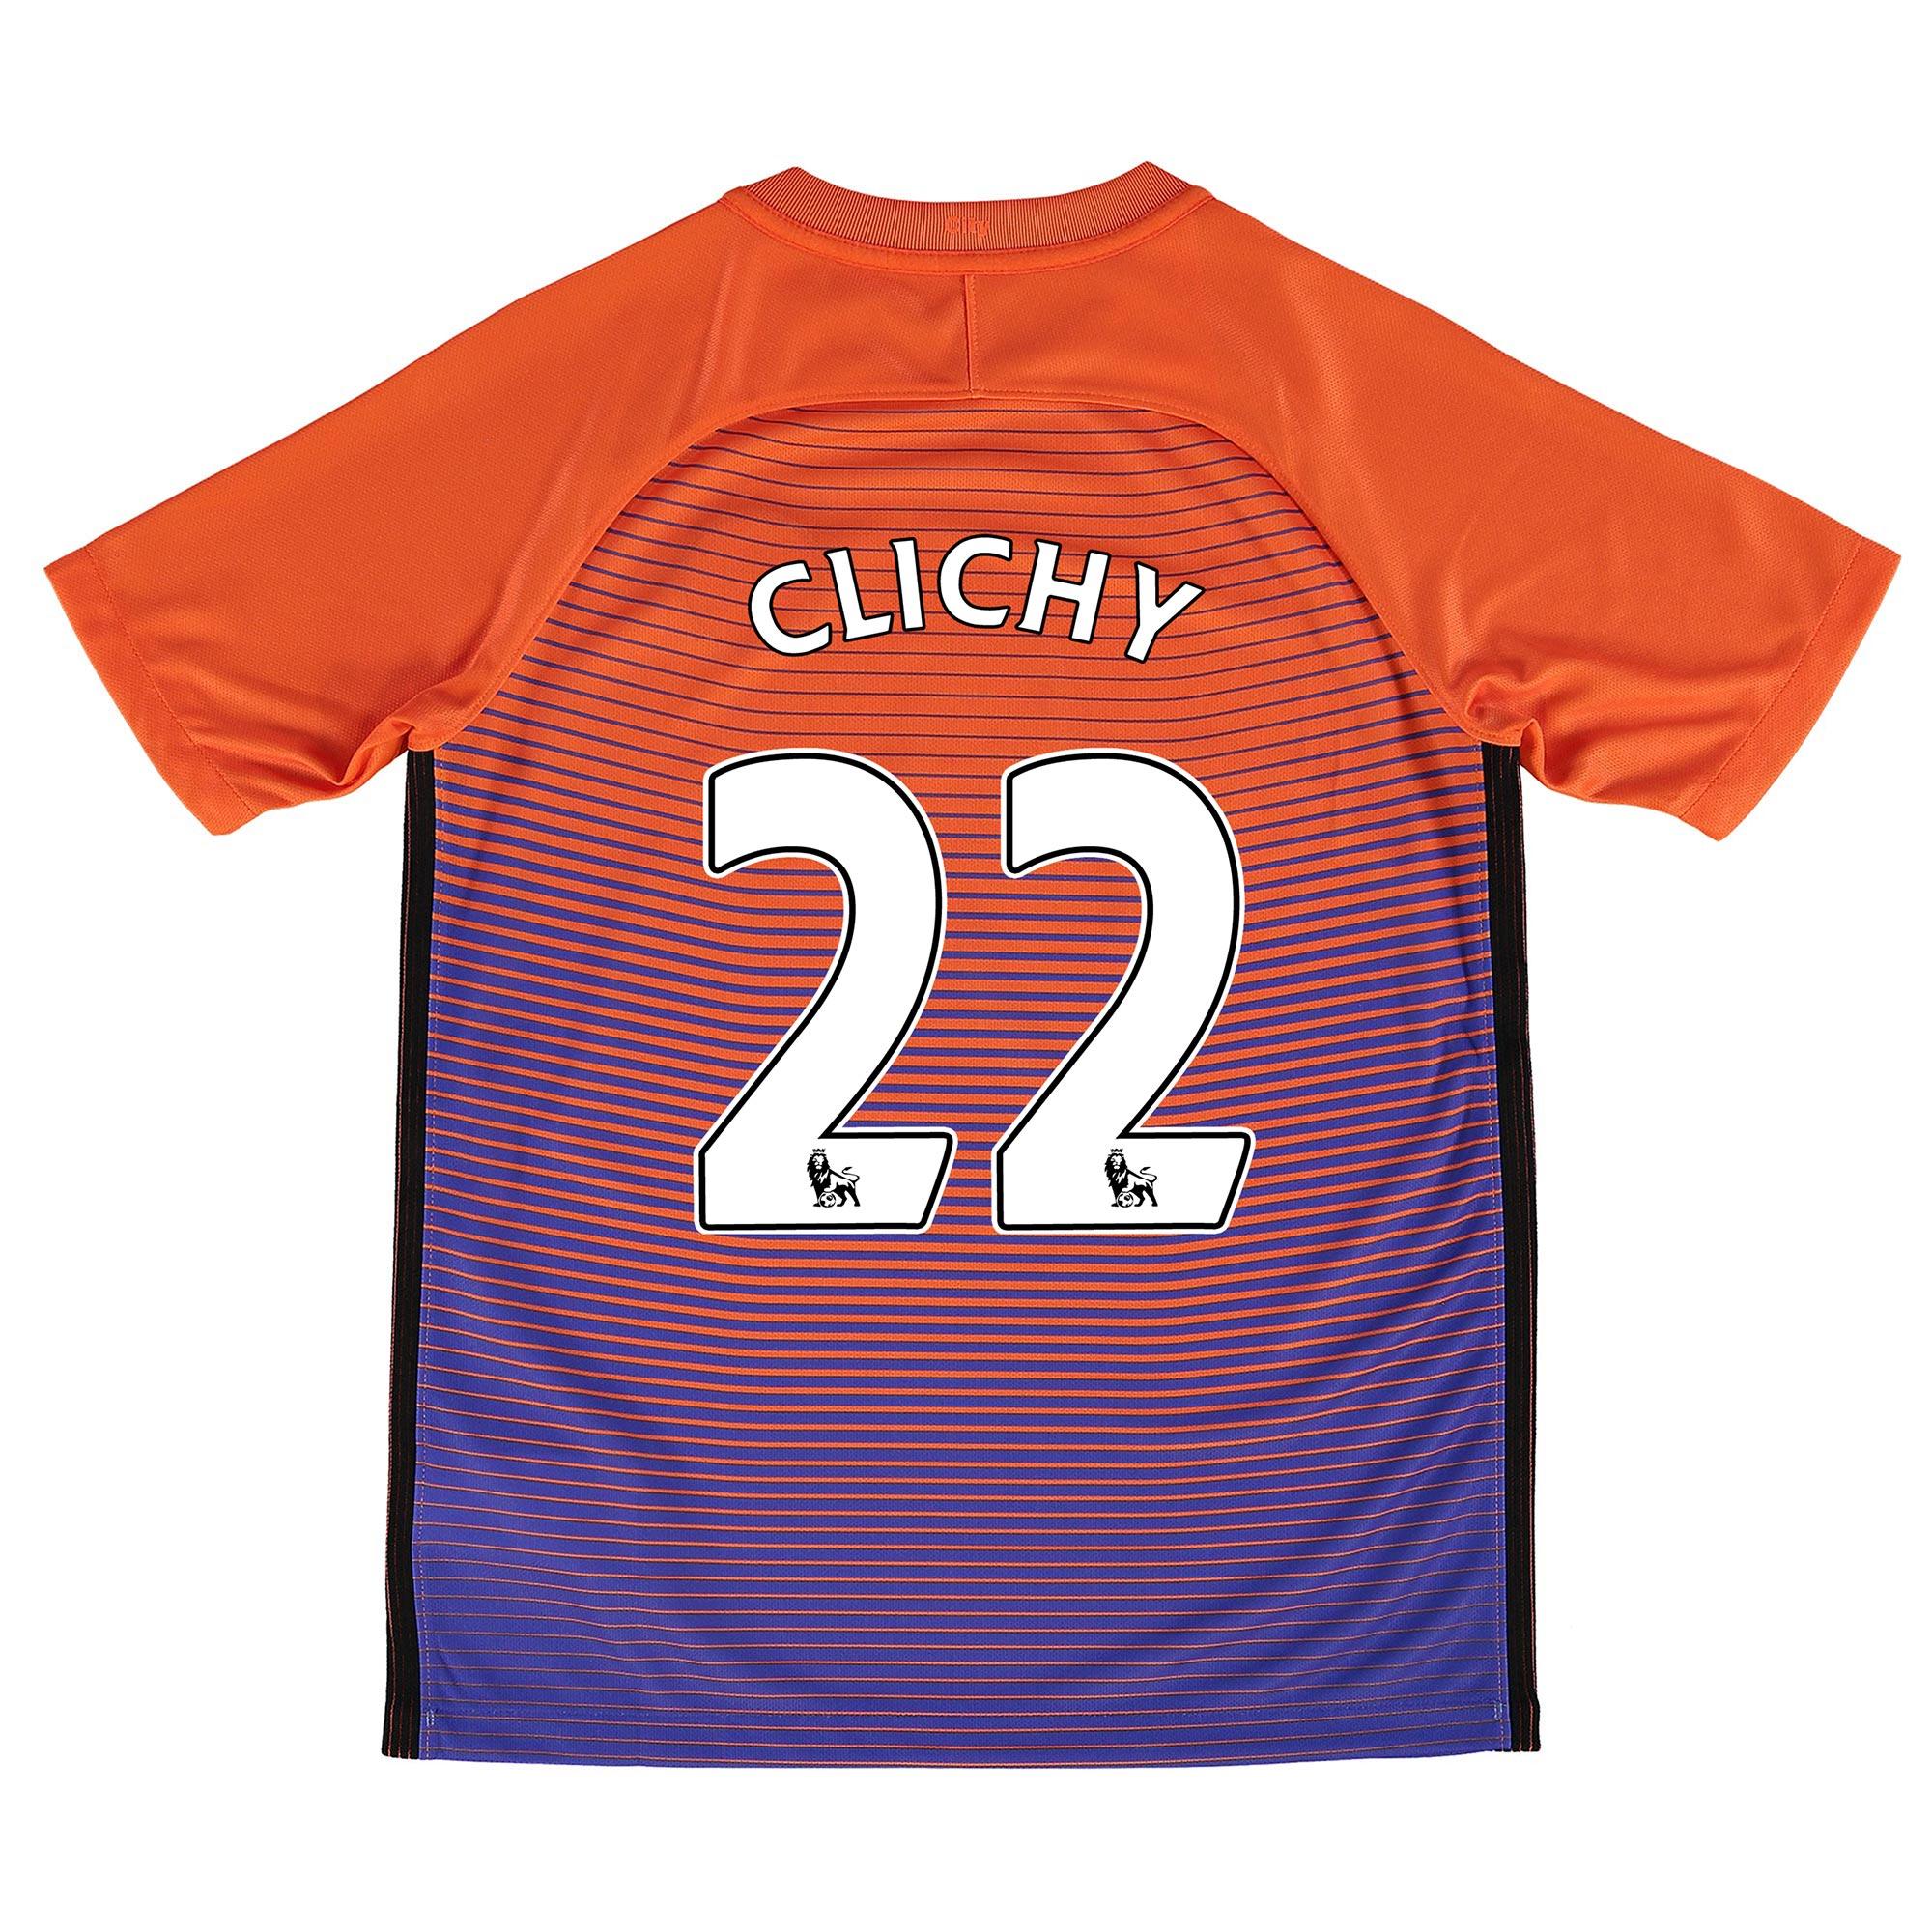 Manchester City Third Stadium Shirt 2016-17 - Kids with Clichy 22 prin